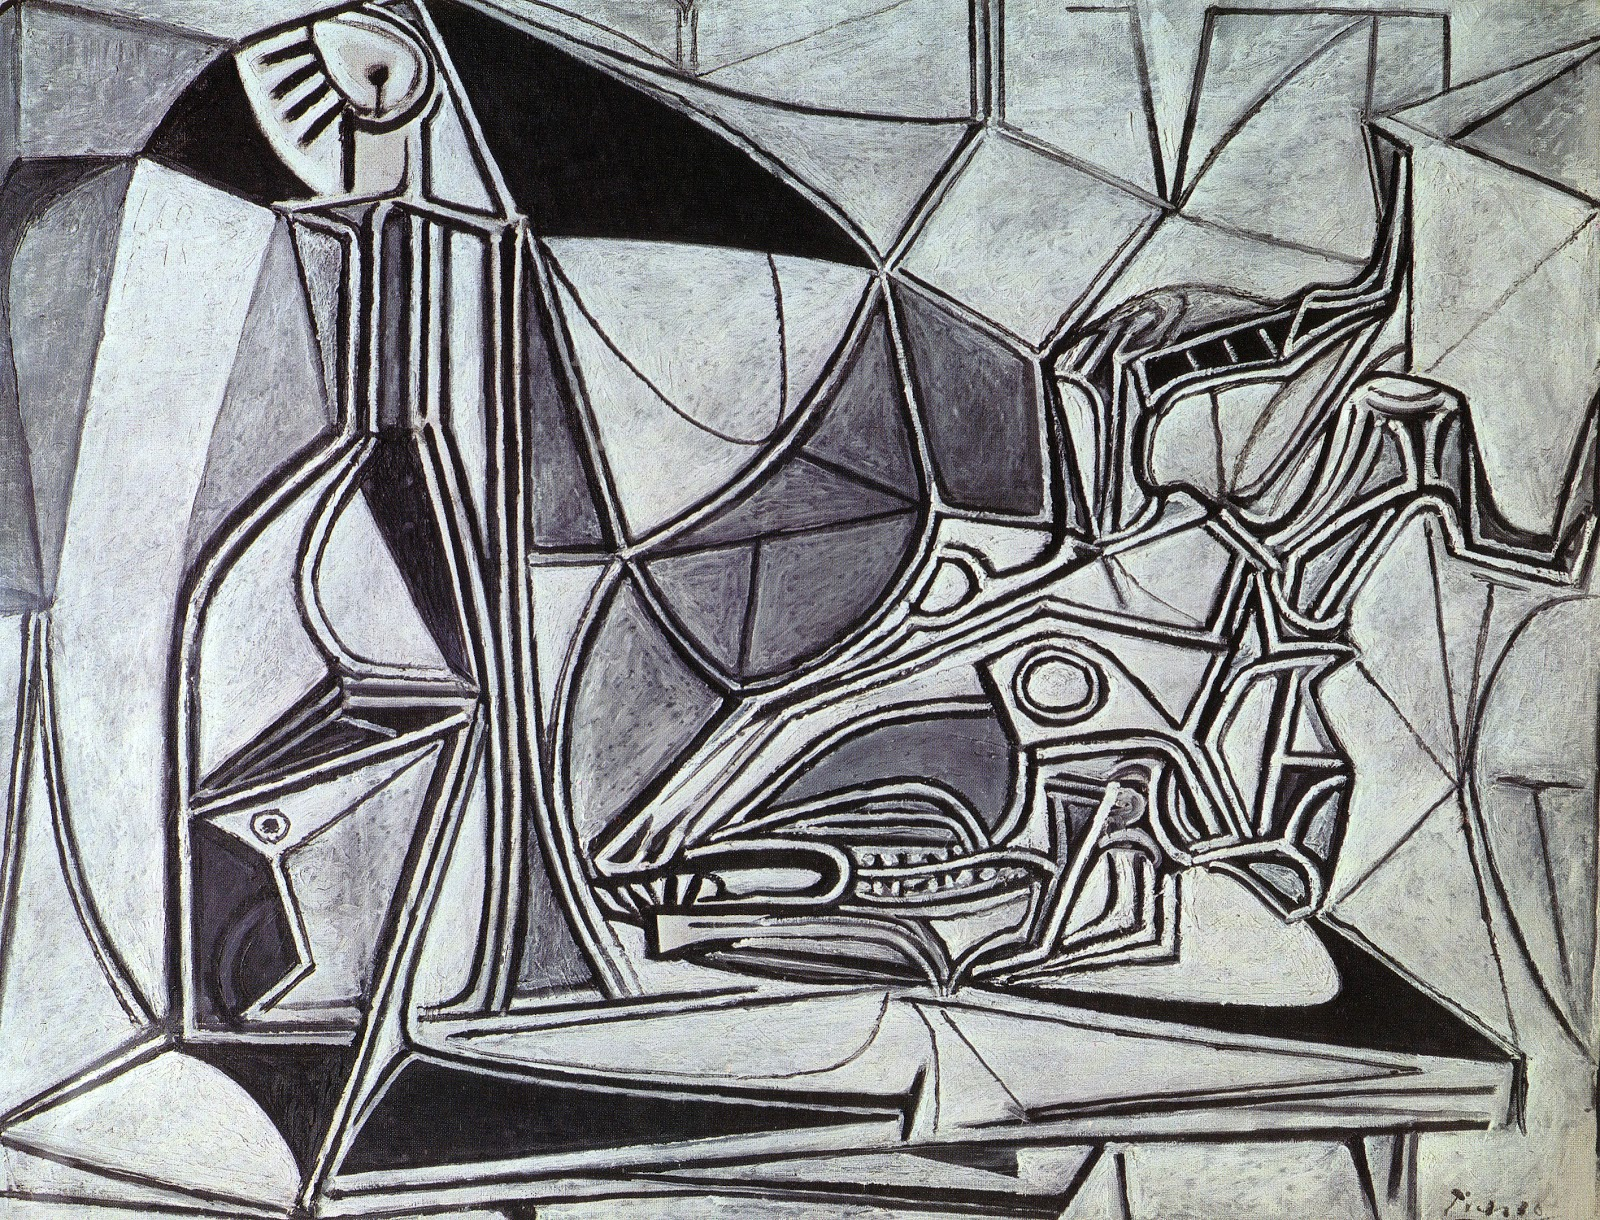 Free Wallpapaers Pablo Picasso Wallpaper